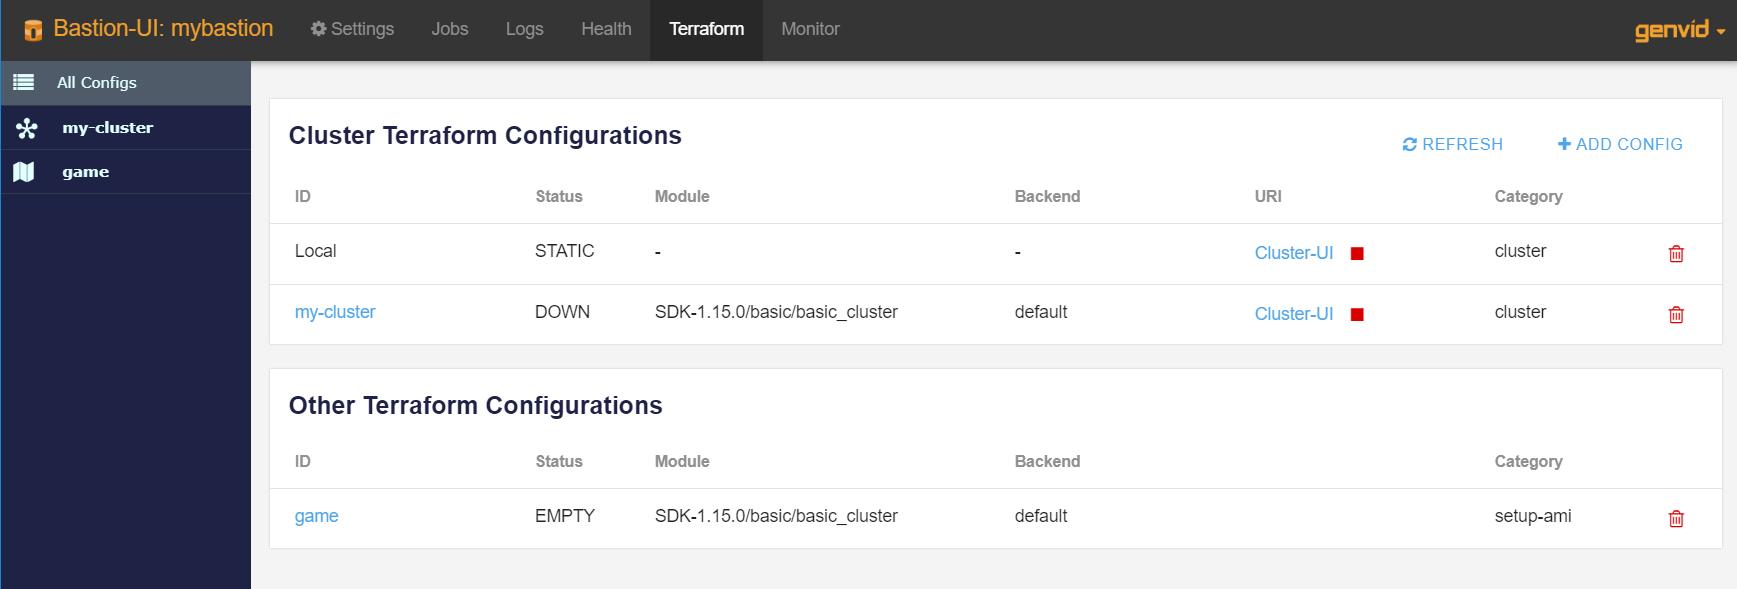 Bastion UI — Genvid Documentation 1 16 0 documentation